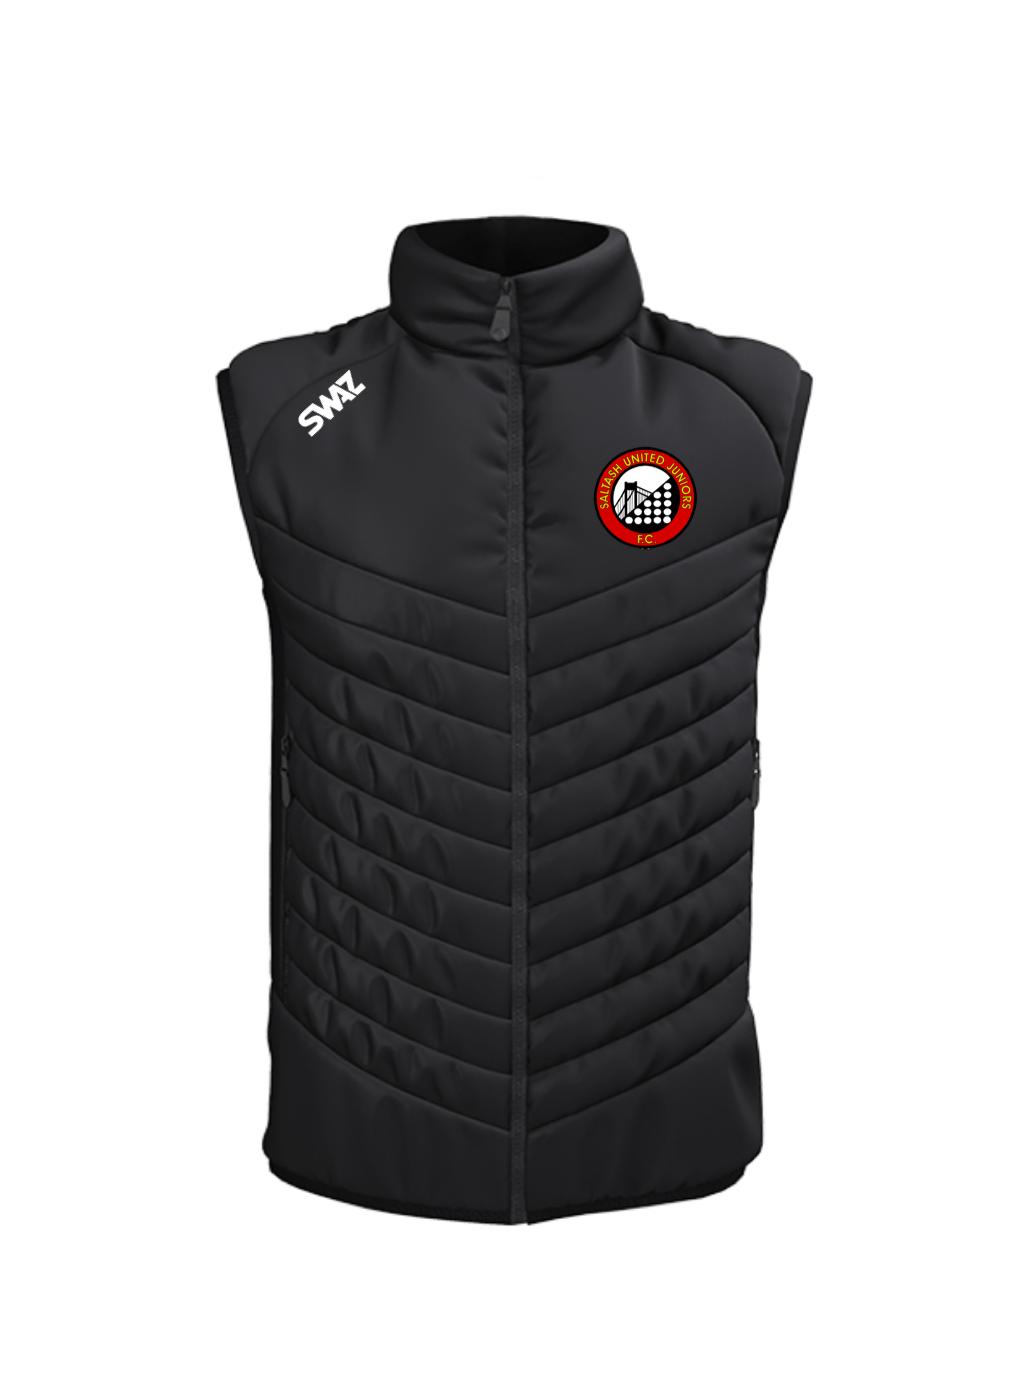 Saltash United Juniors Gilet | SWAZ Teamwear | Football Kit Supplier